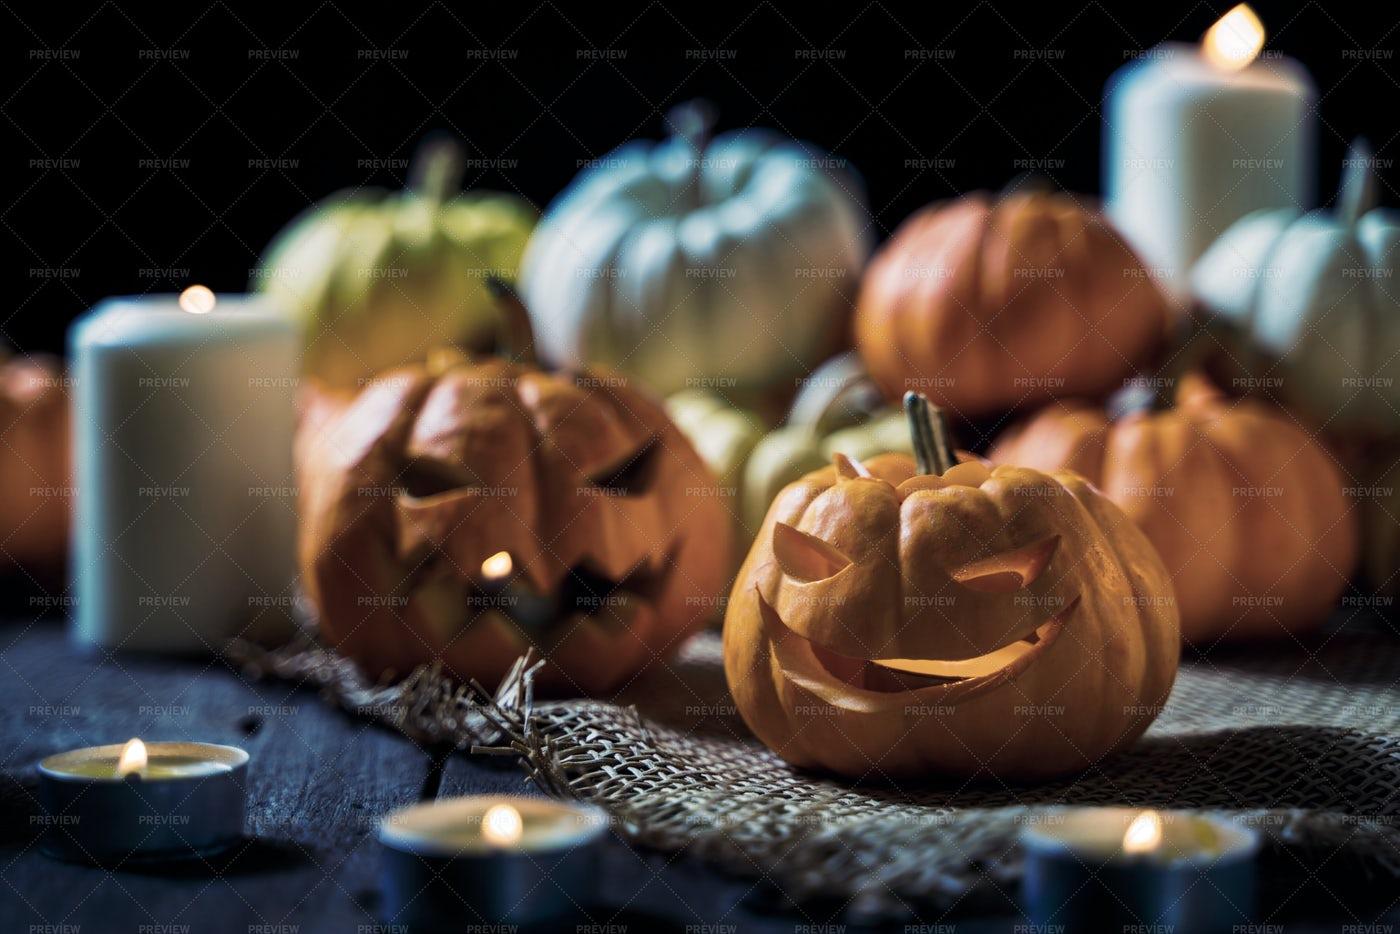 Scary Pumpkins For Halloween: Stock Photos